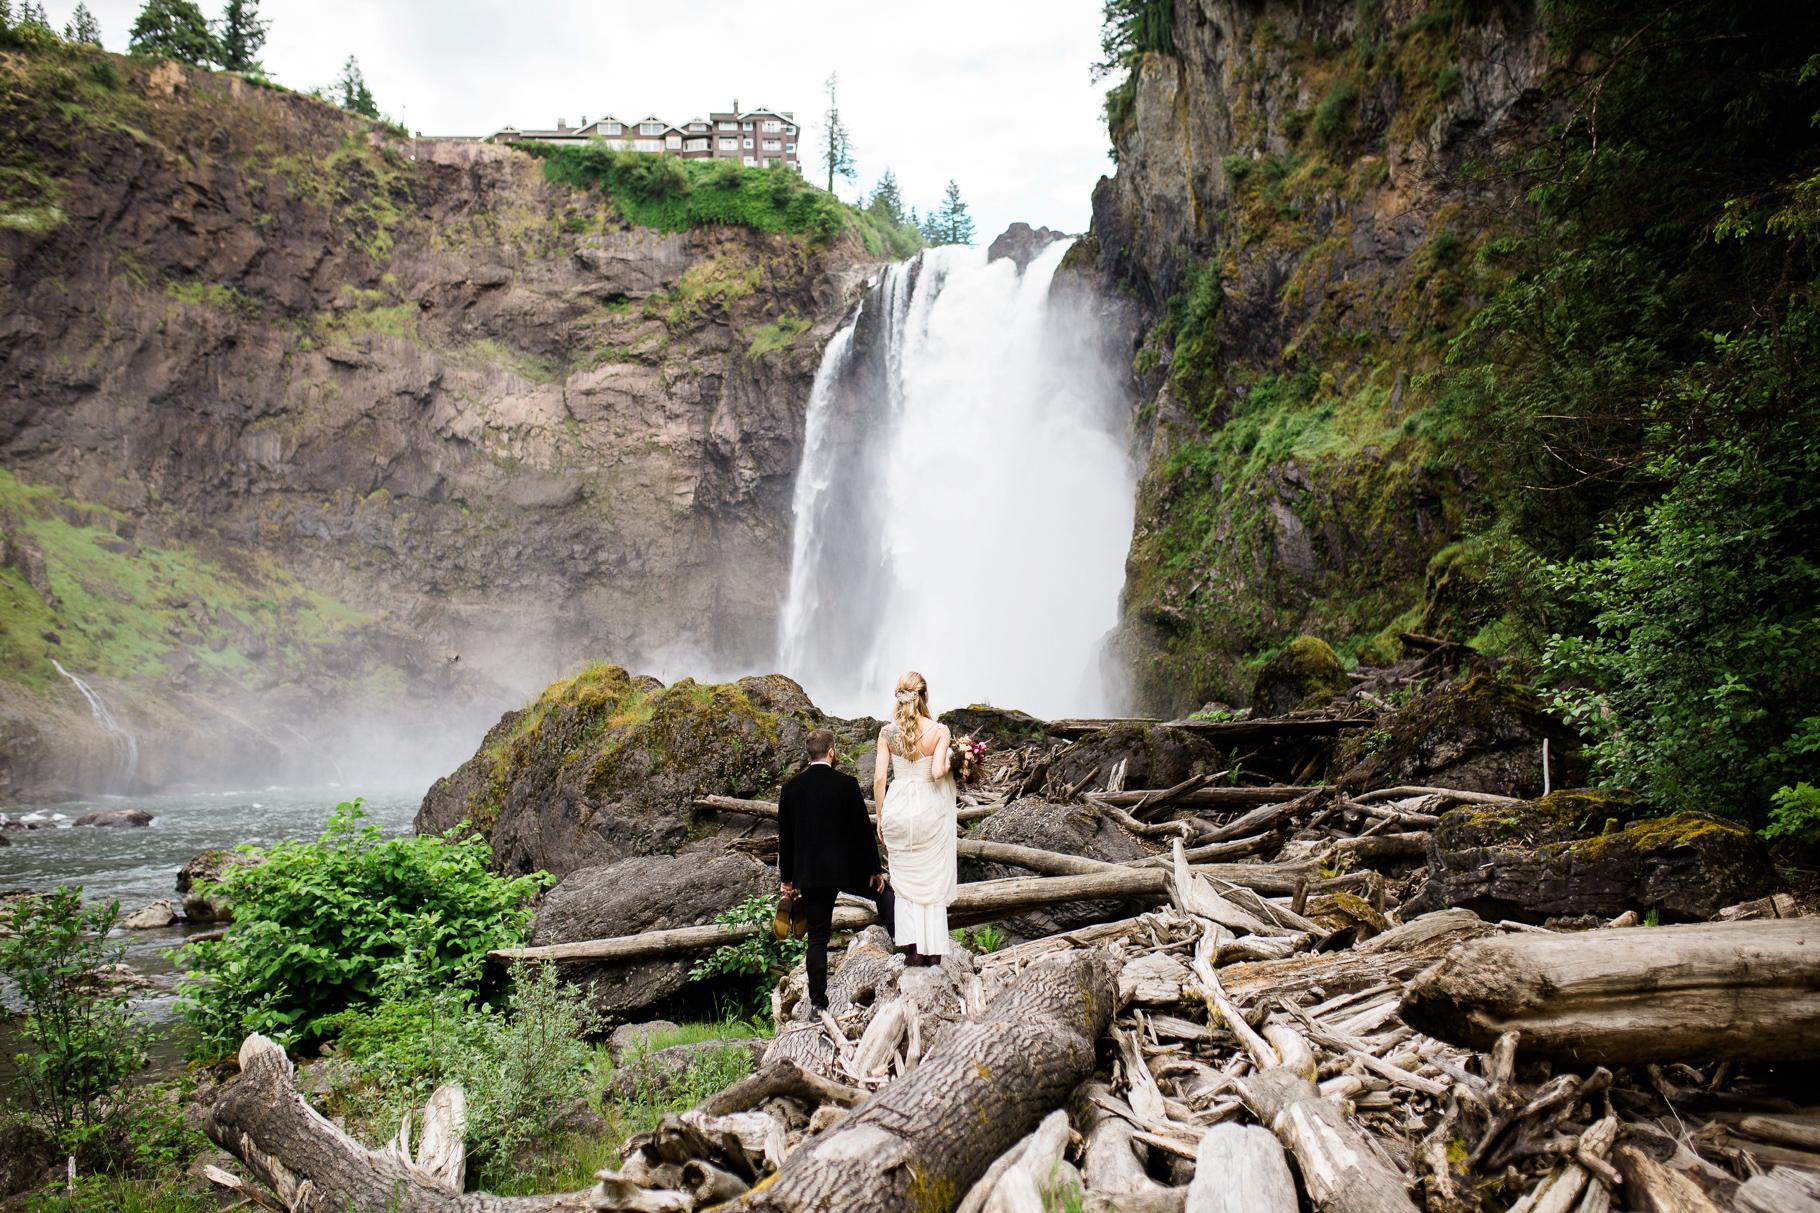 19-Adventure-Elopement-Waterfall-Seattle-Wedding-Photographer-Snoqualmie-Falls-Hike